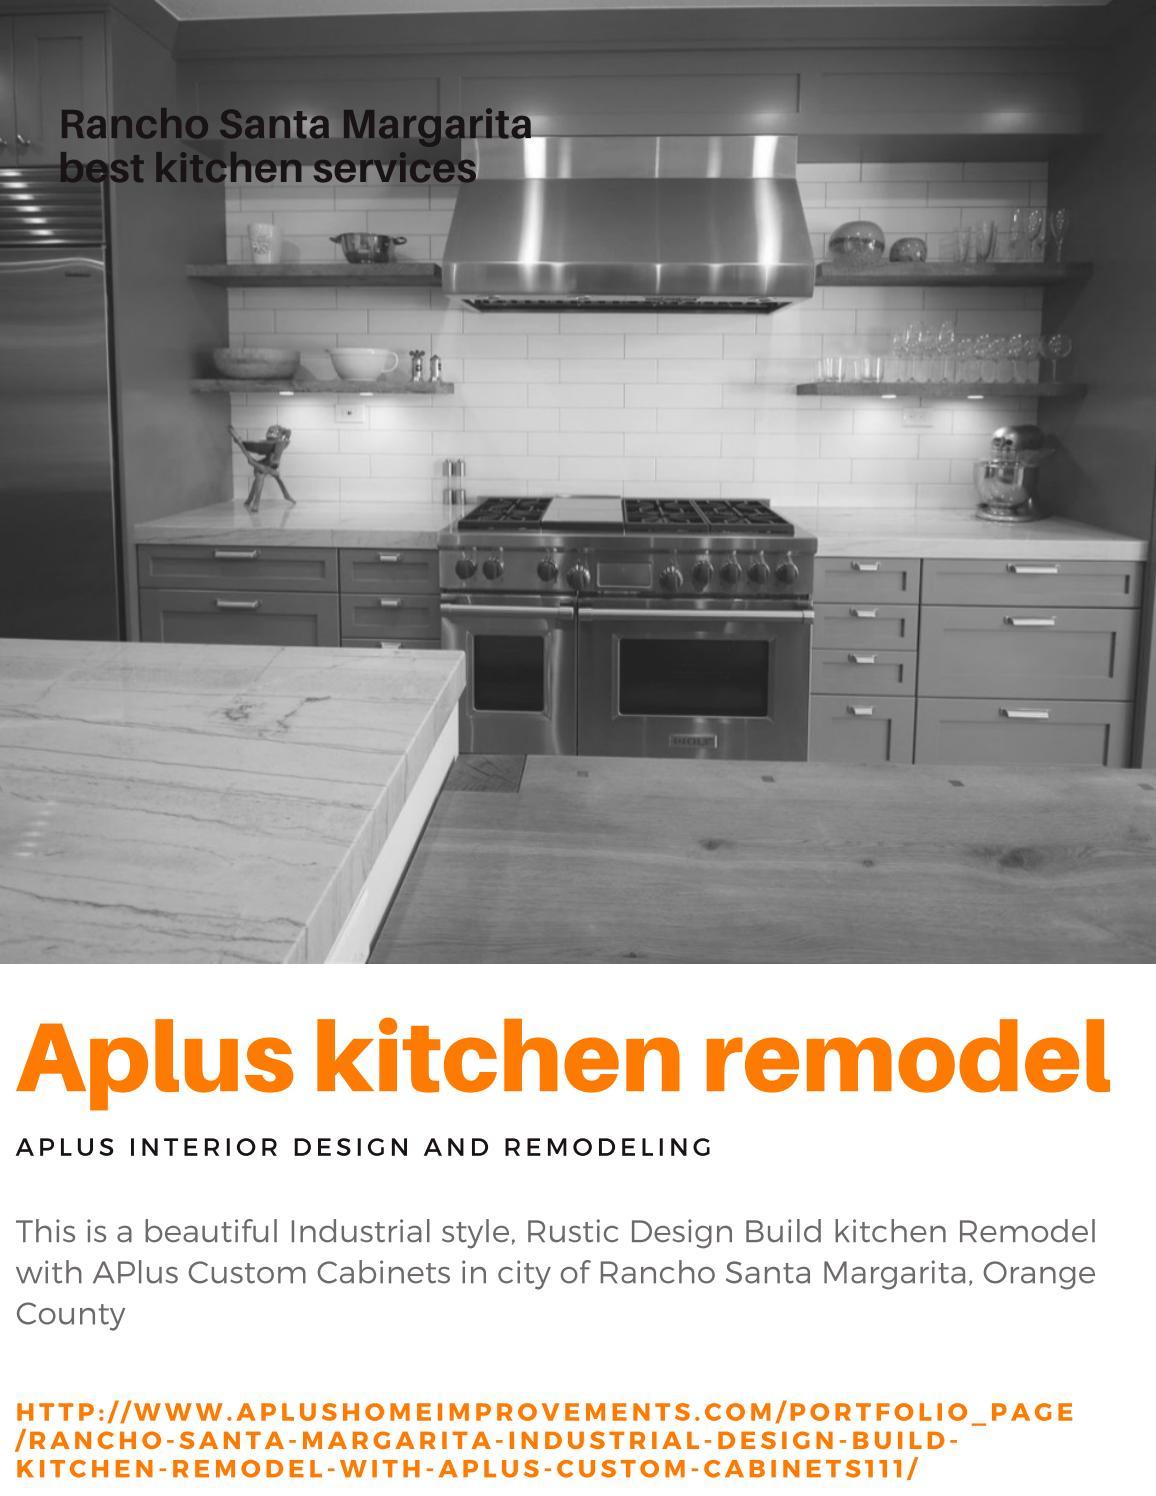 Rancho Santa Margarita Kitchen Remodel By Alex Tabrizi Issuu